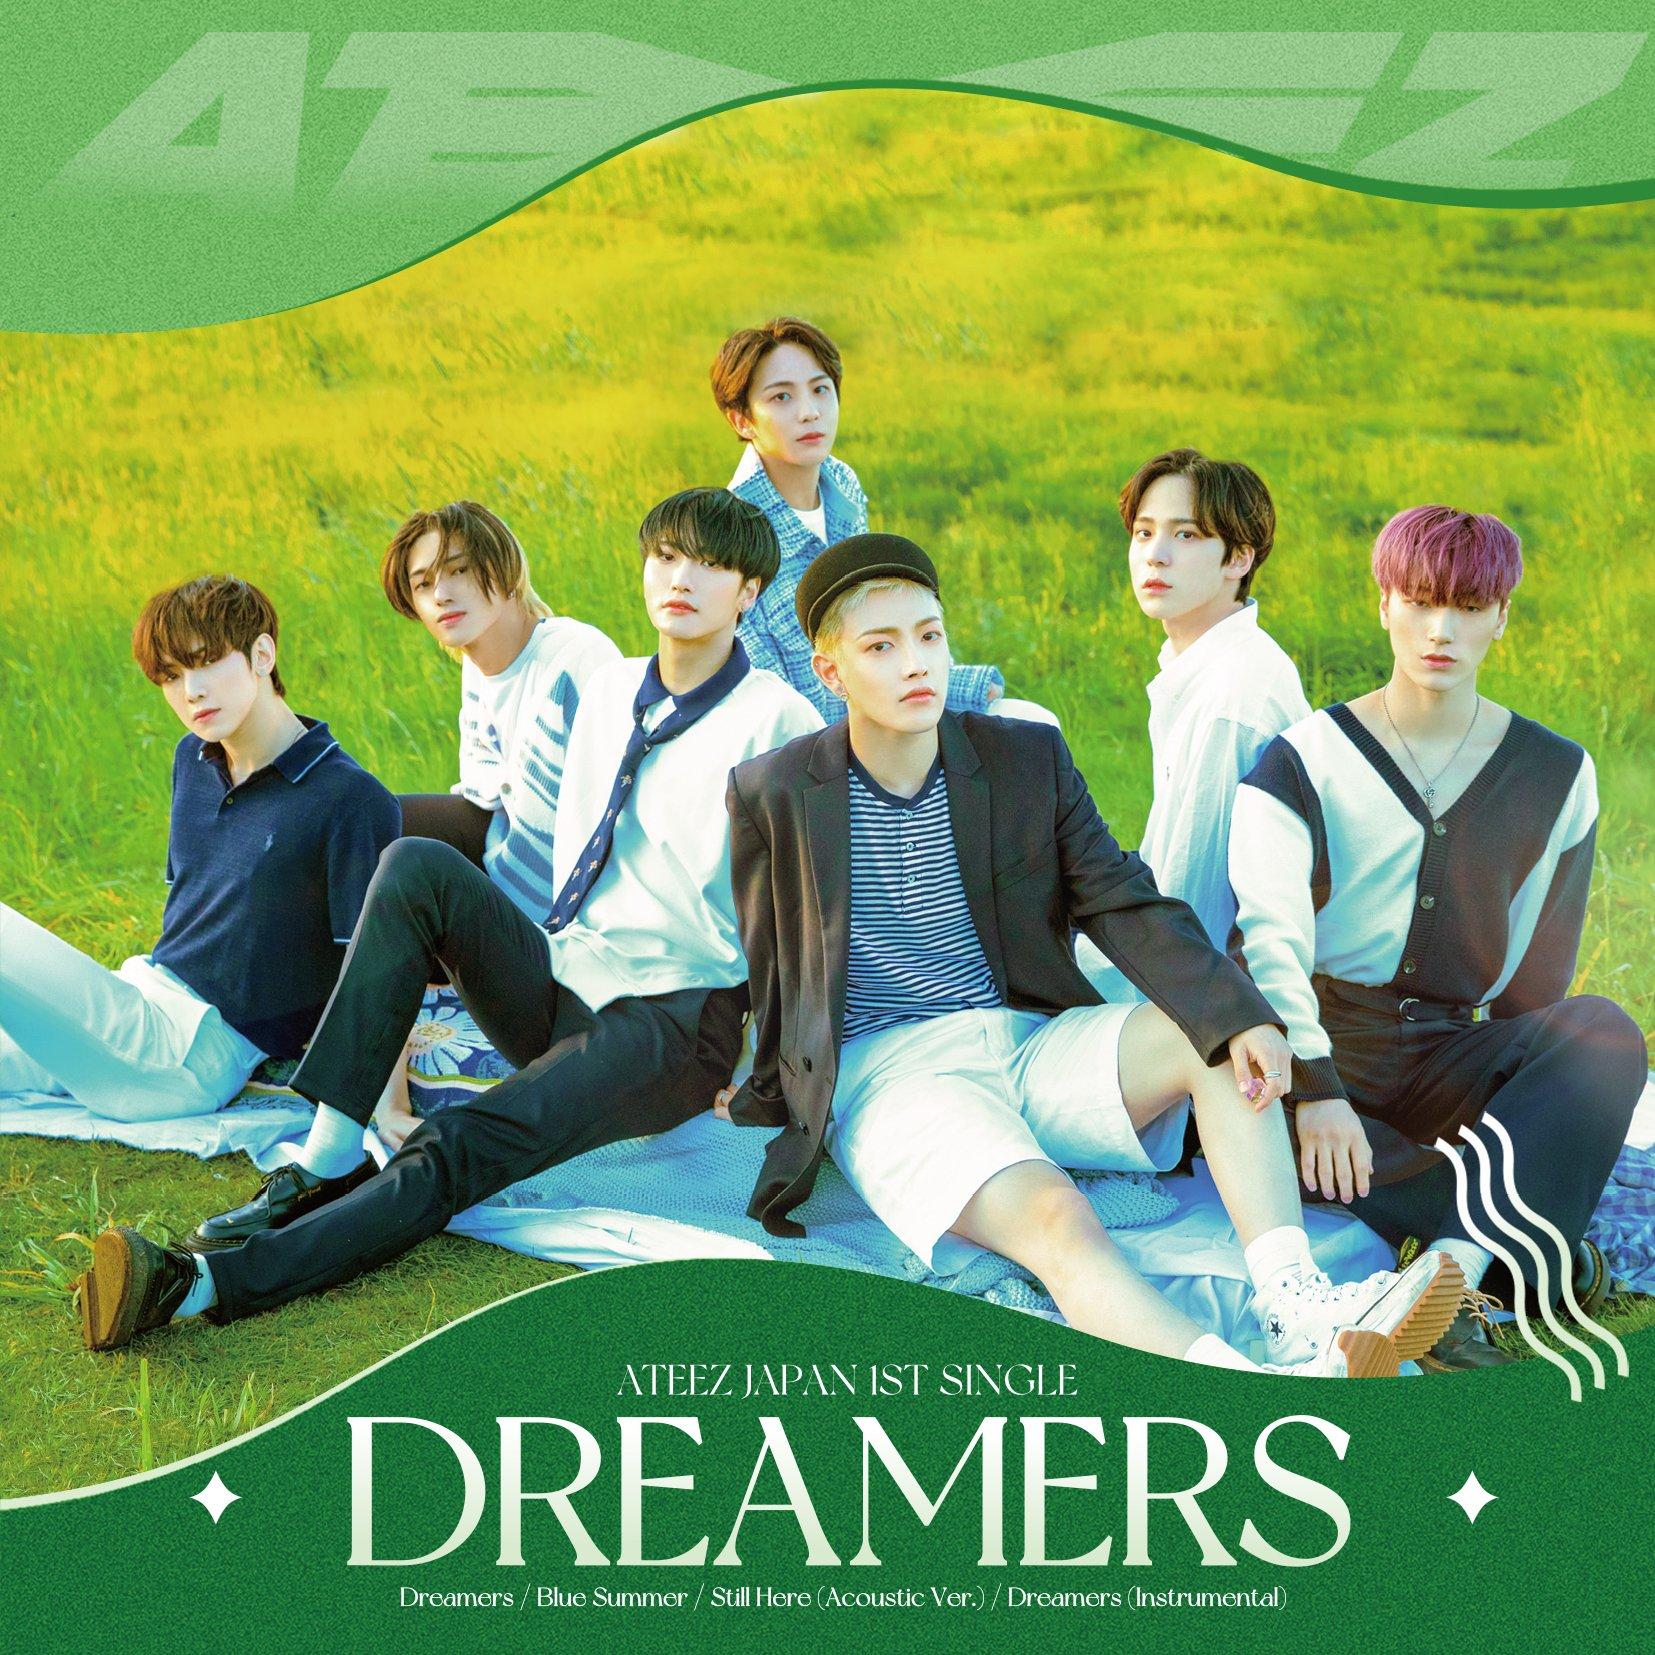 ATEEZ JAPAN - Dreamers